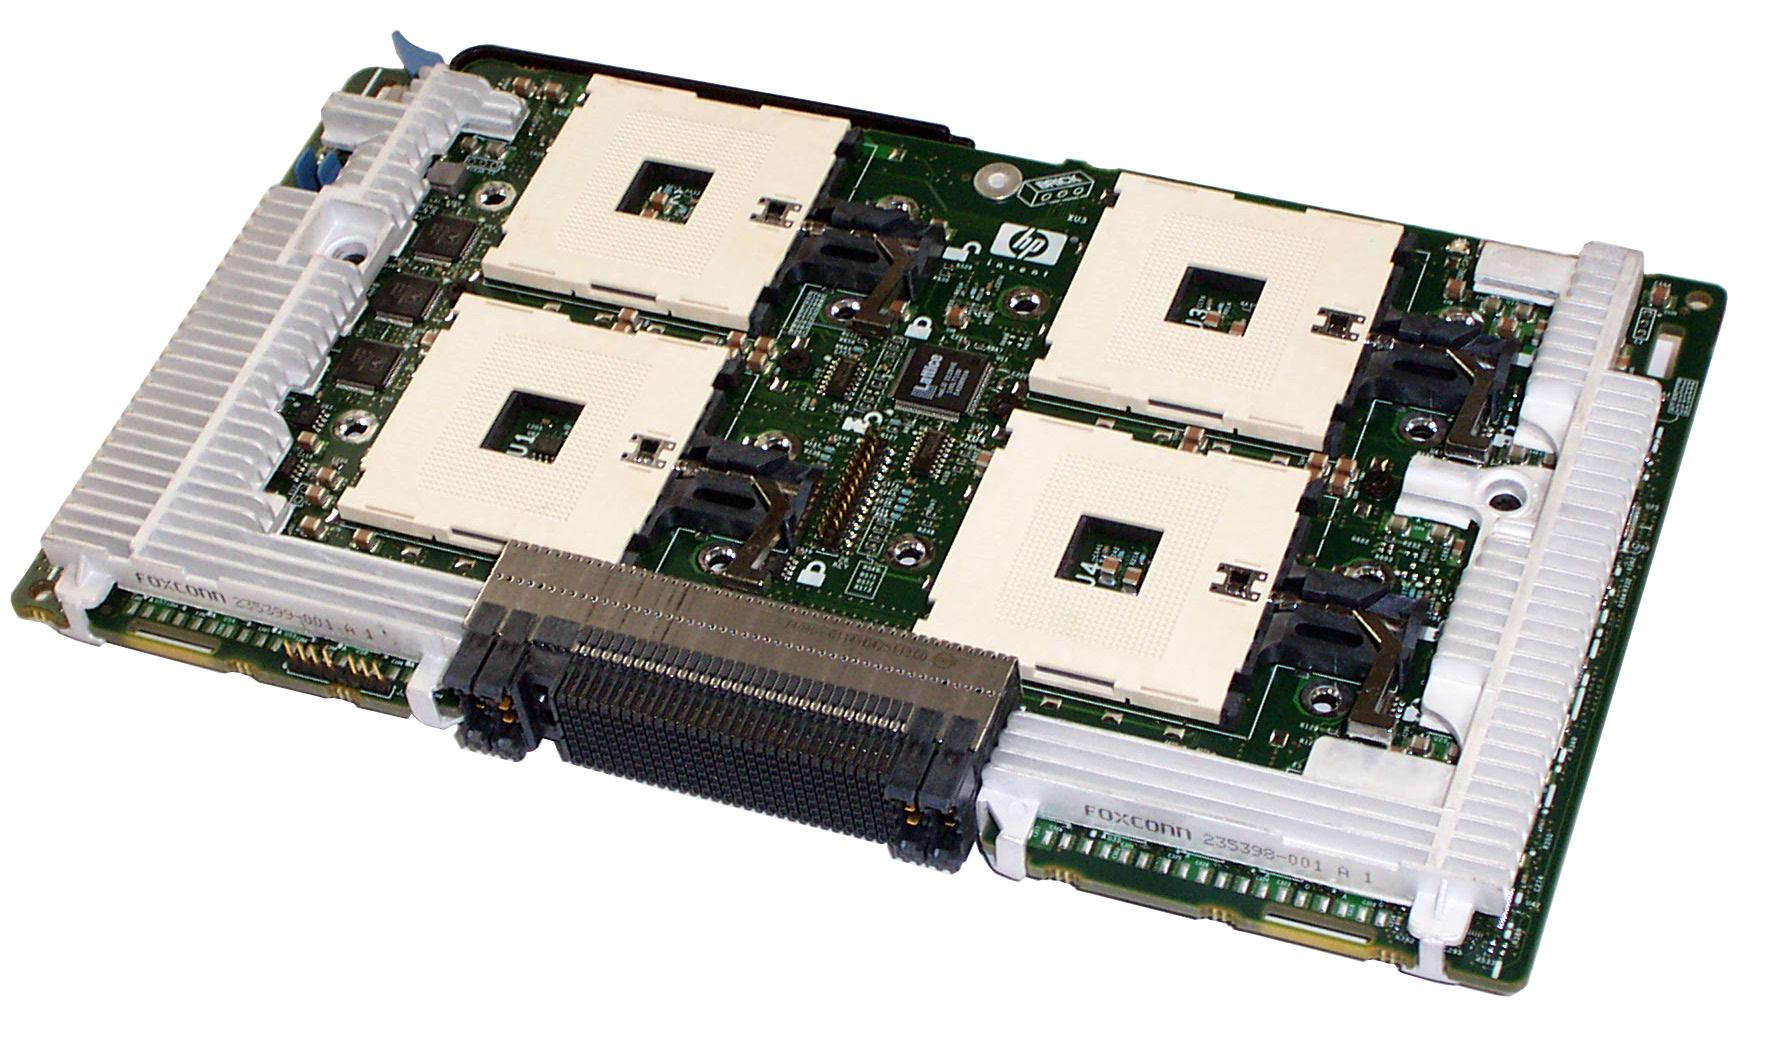 HP 203226-001 Quad Socket CPU Board DL740 DL760 - 314379-001